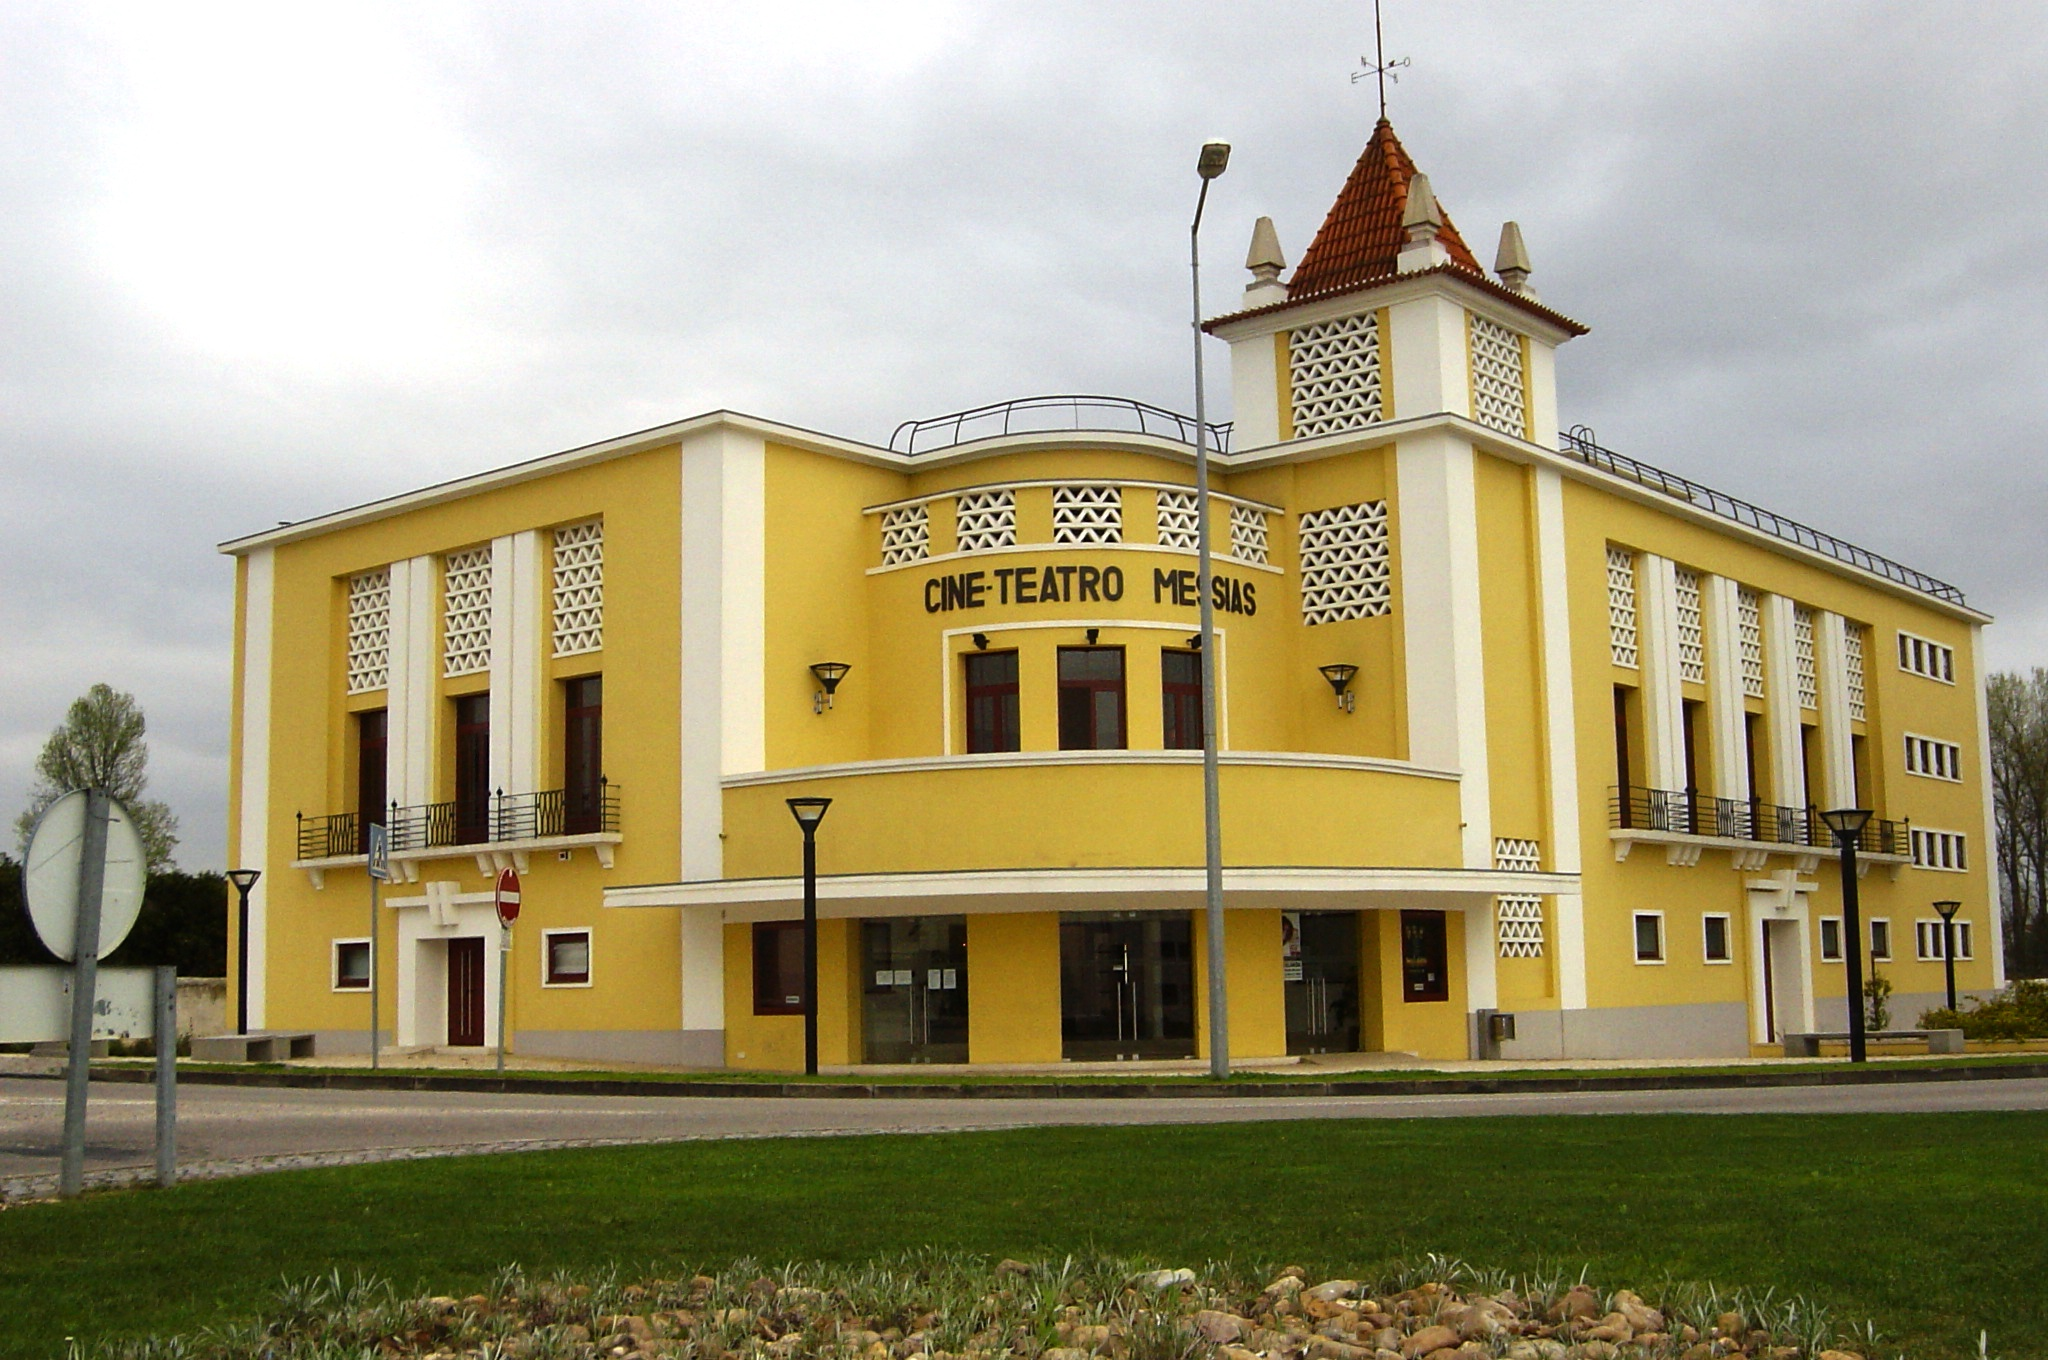 Cine-Teatro Municipal Messias